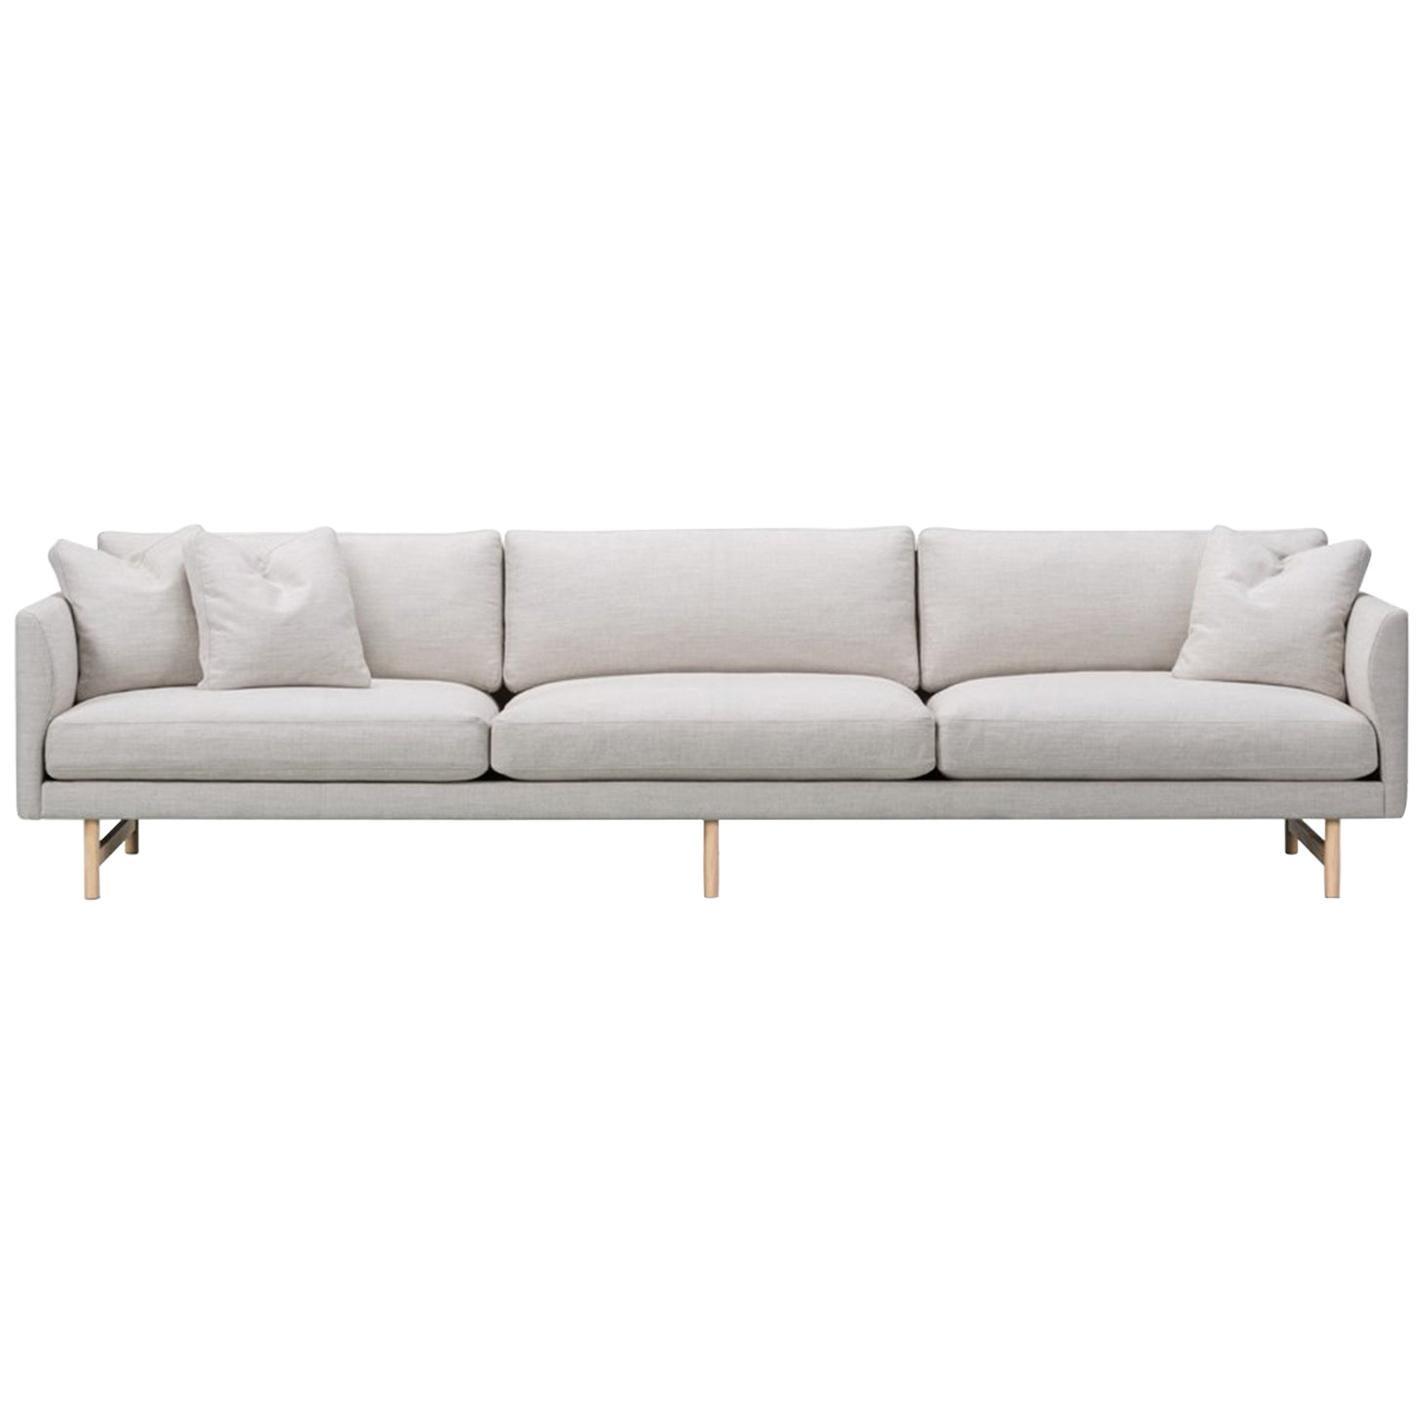 Hugo Passos Calmo Sofa 95, 3-Seater, Wood Base